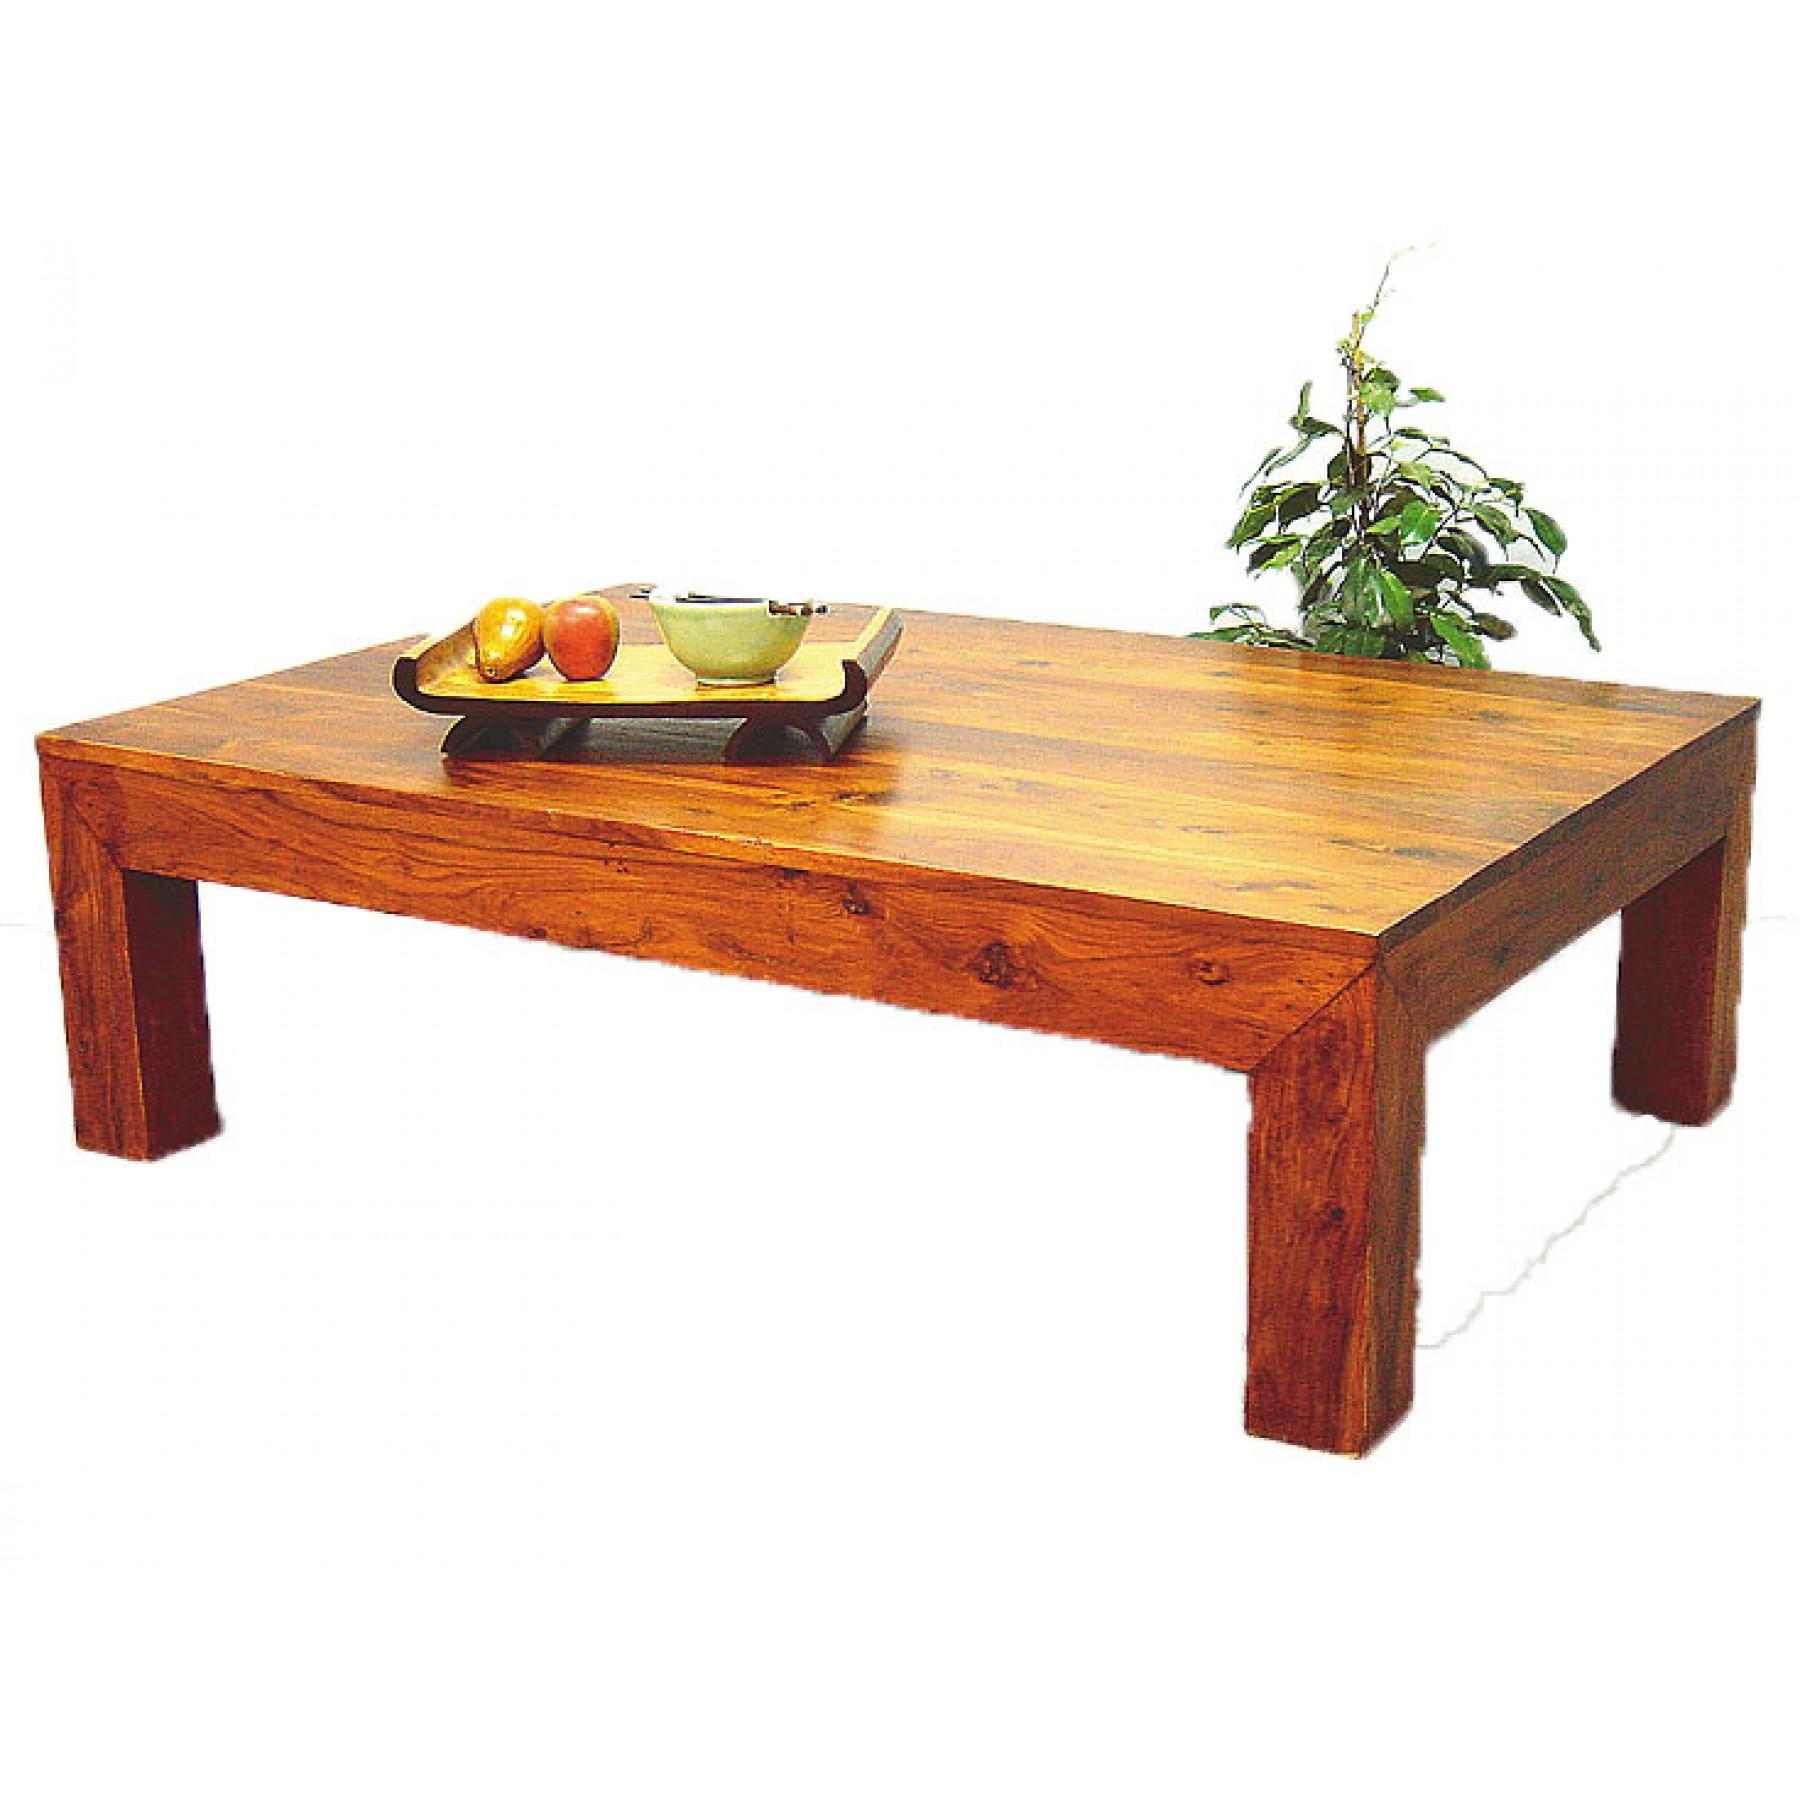 Table basse zen Hindi 3